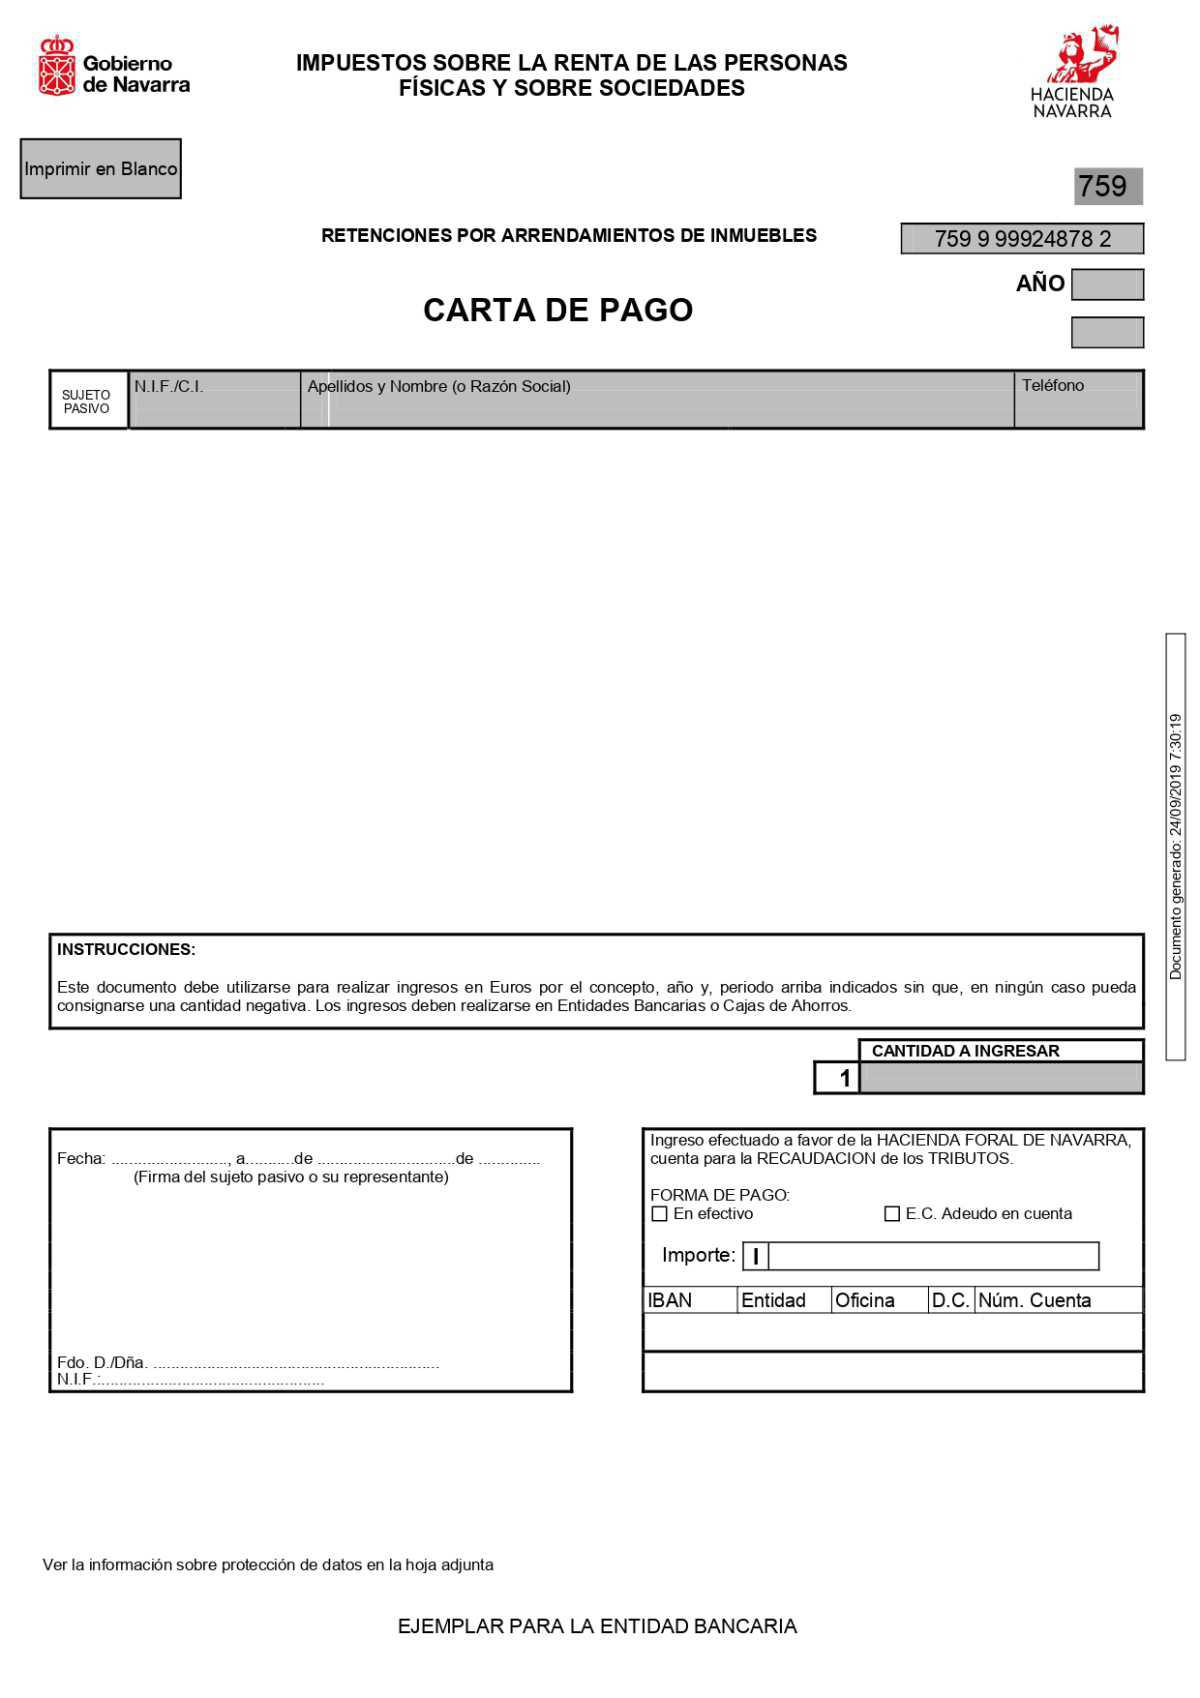 MODELO 759 PARA NAVARRA